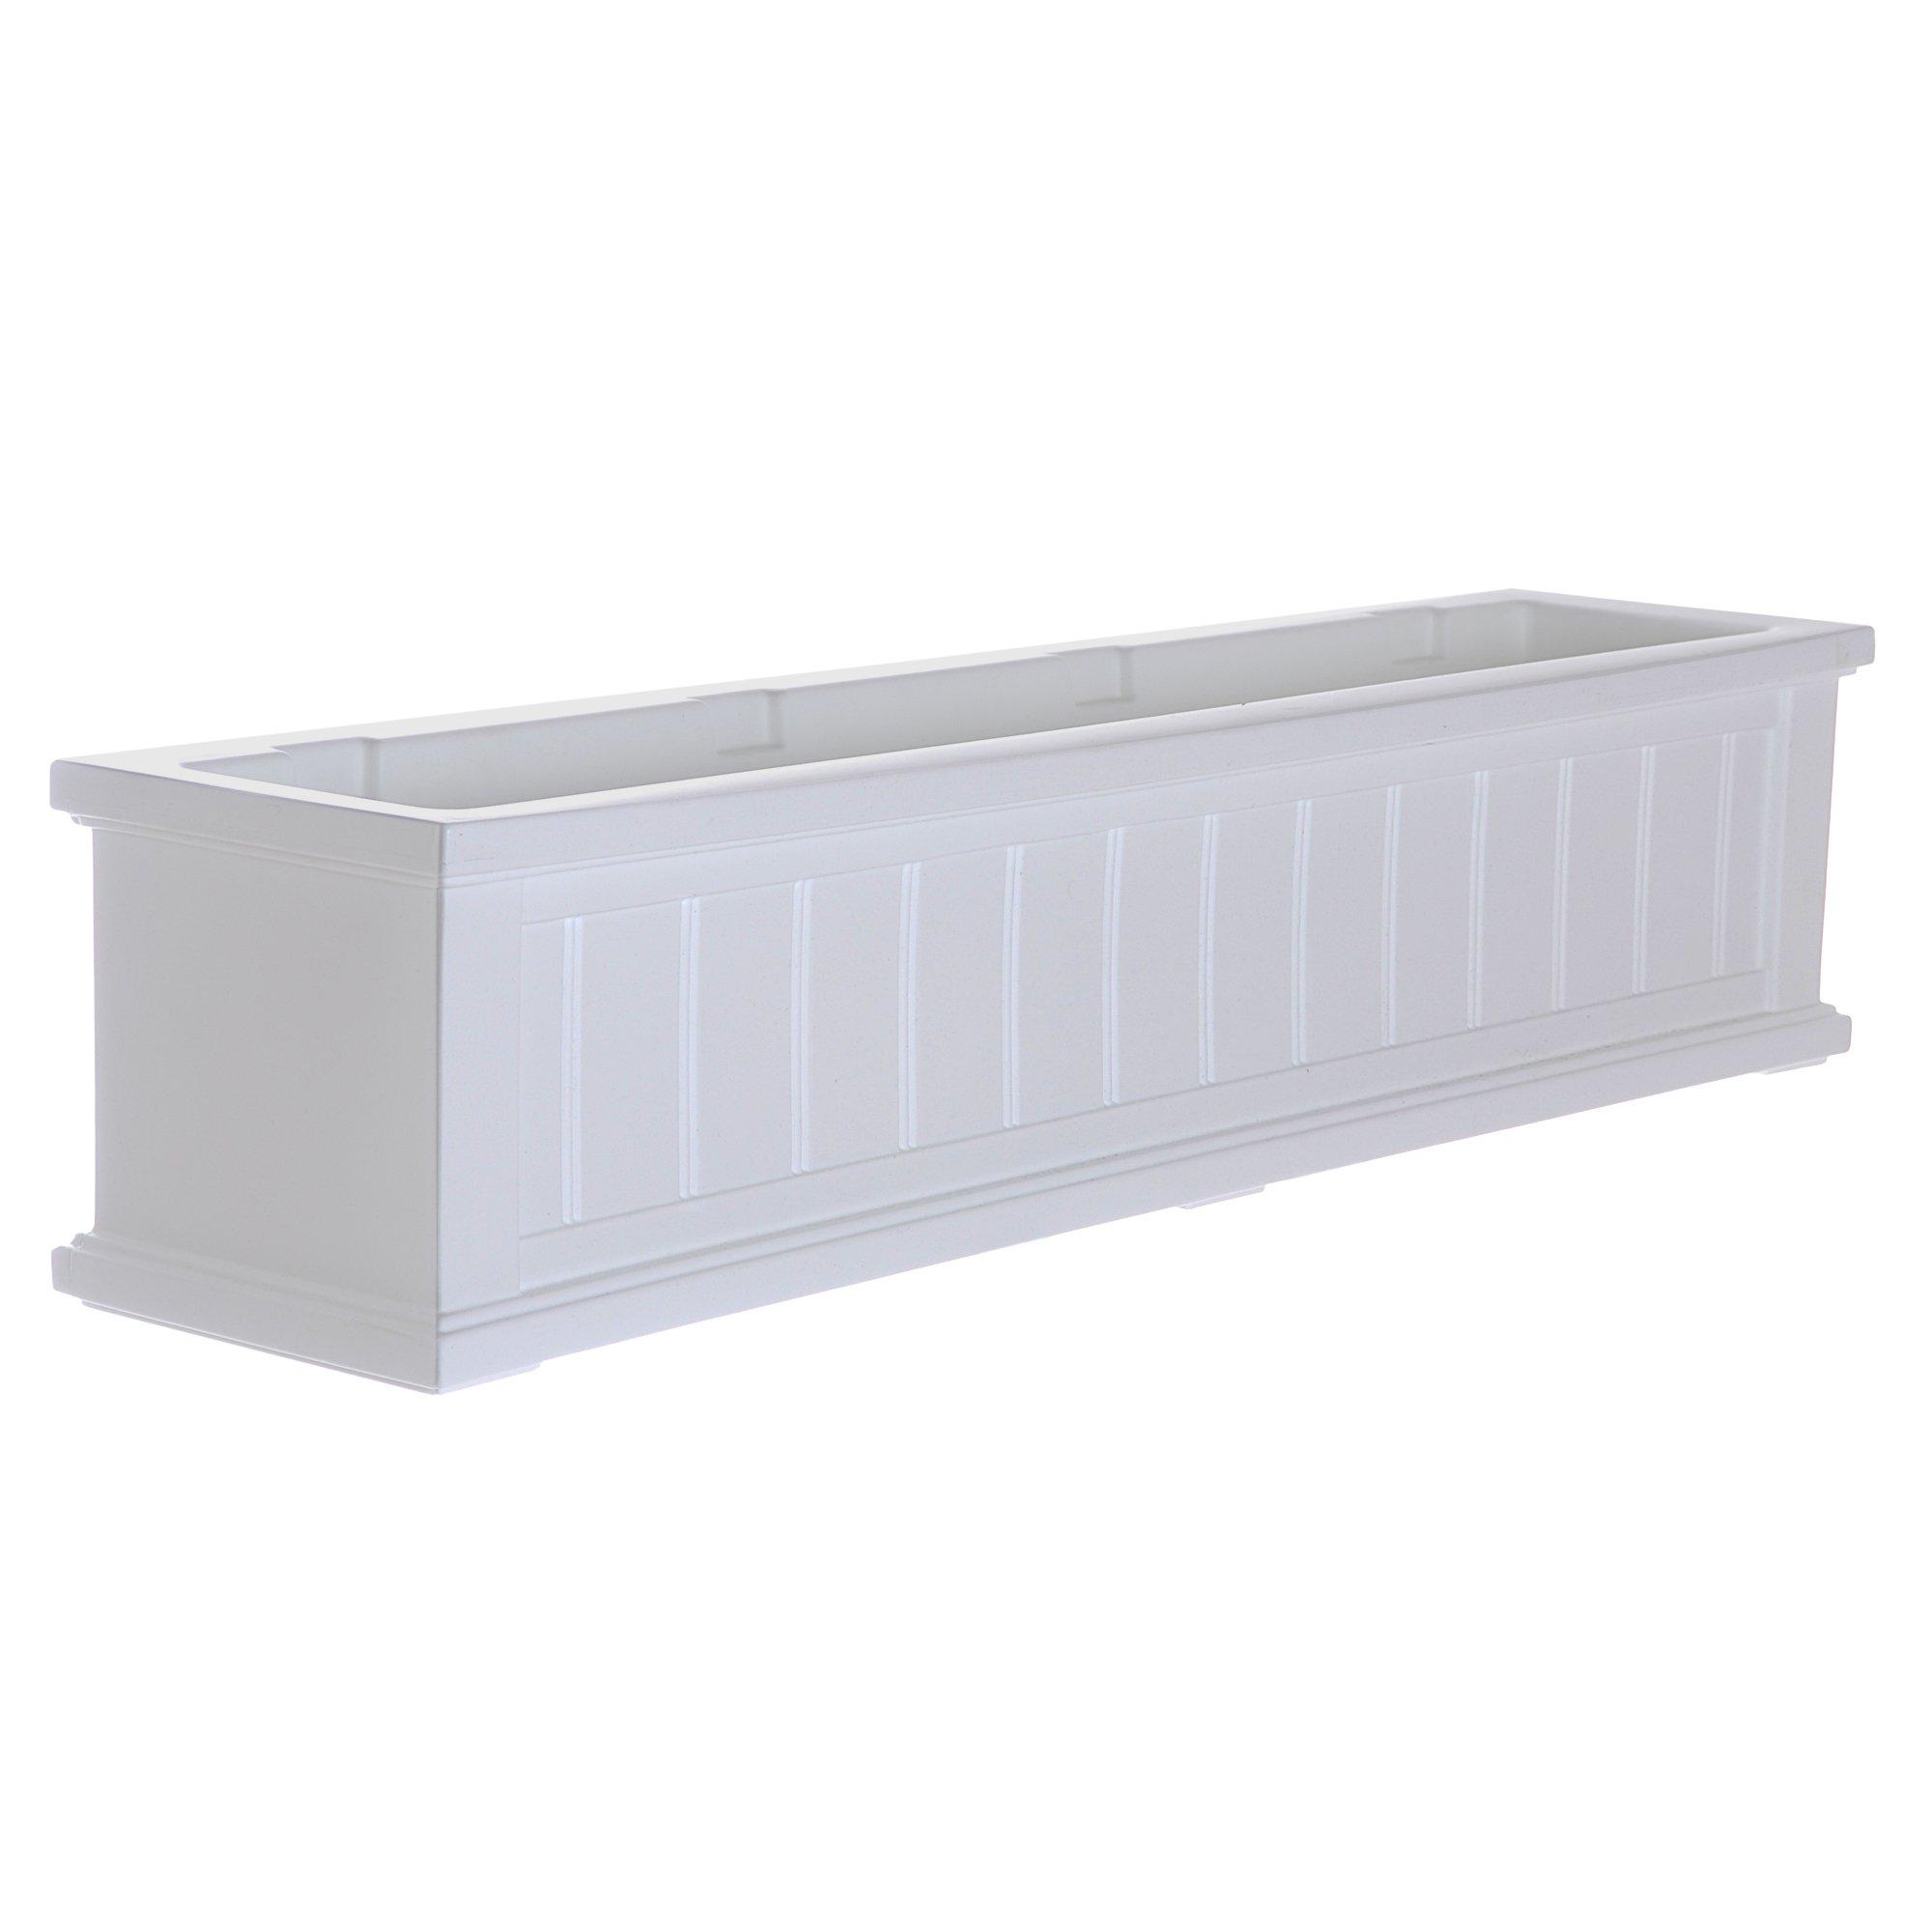 Mayne 4841-W Cape Cod Polyethylene Window Box, 4' White